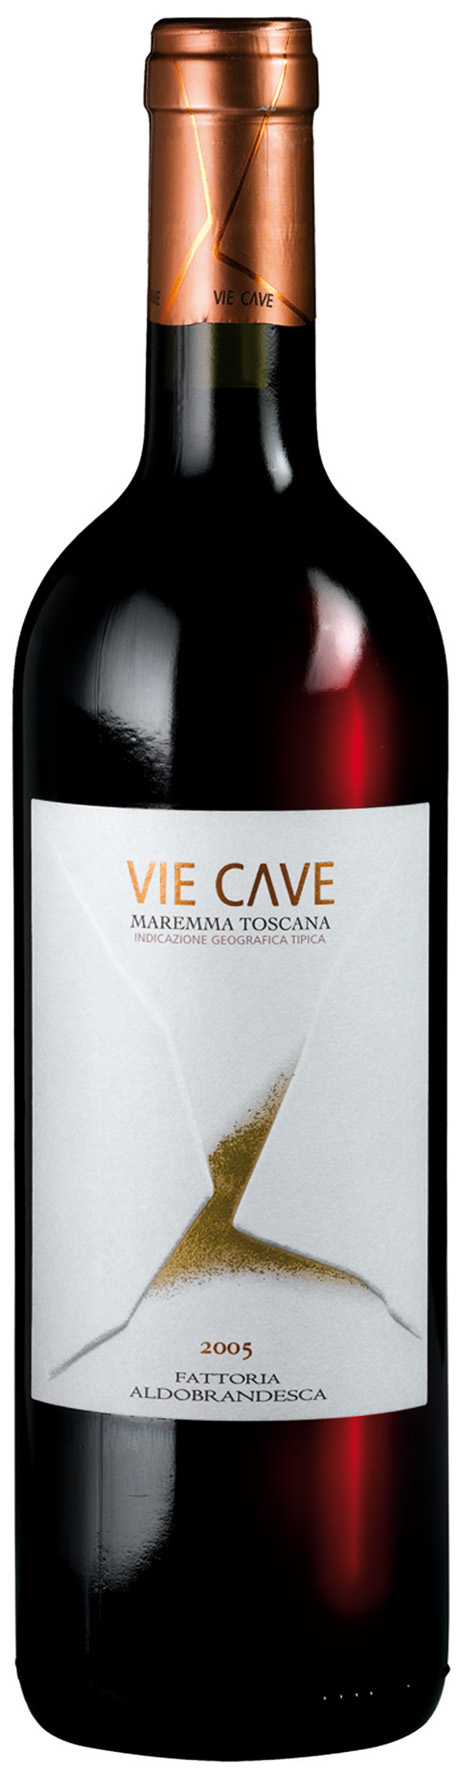 2012 Vie Cave Maremma Toscana IGT Antinori Fattoria Aldobrandesca